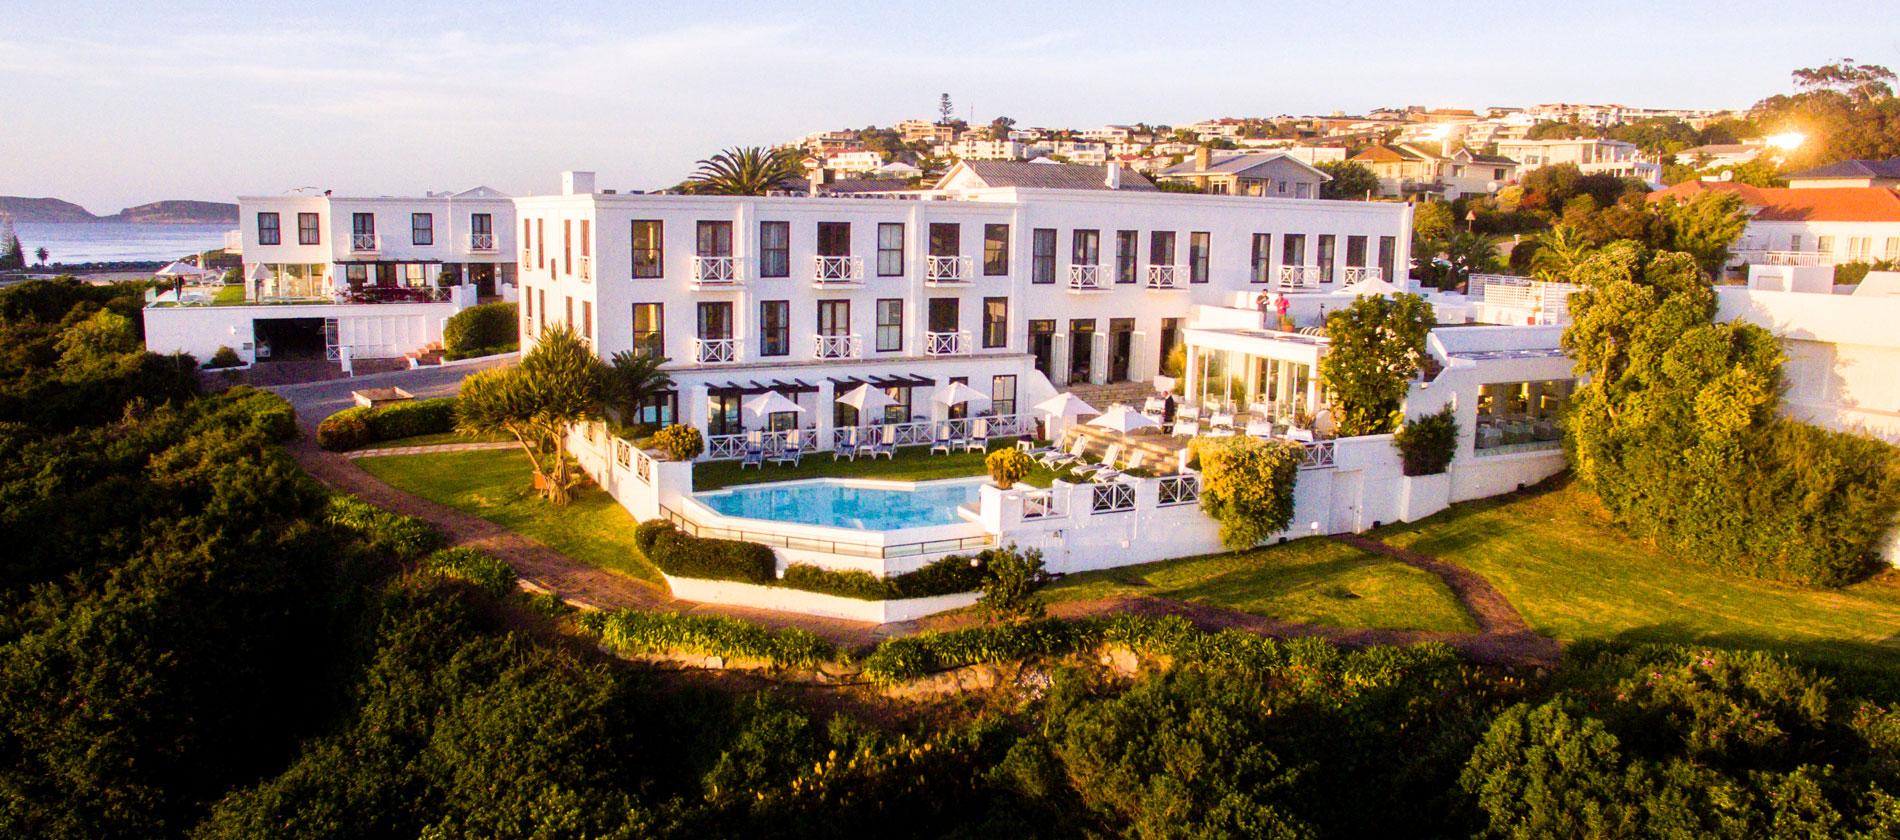 The Plettenberg Hotel   Enchanting Travels